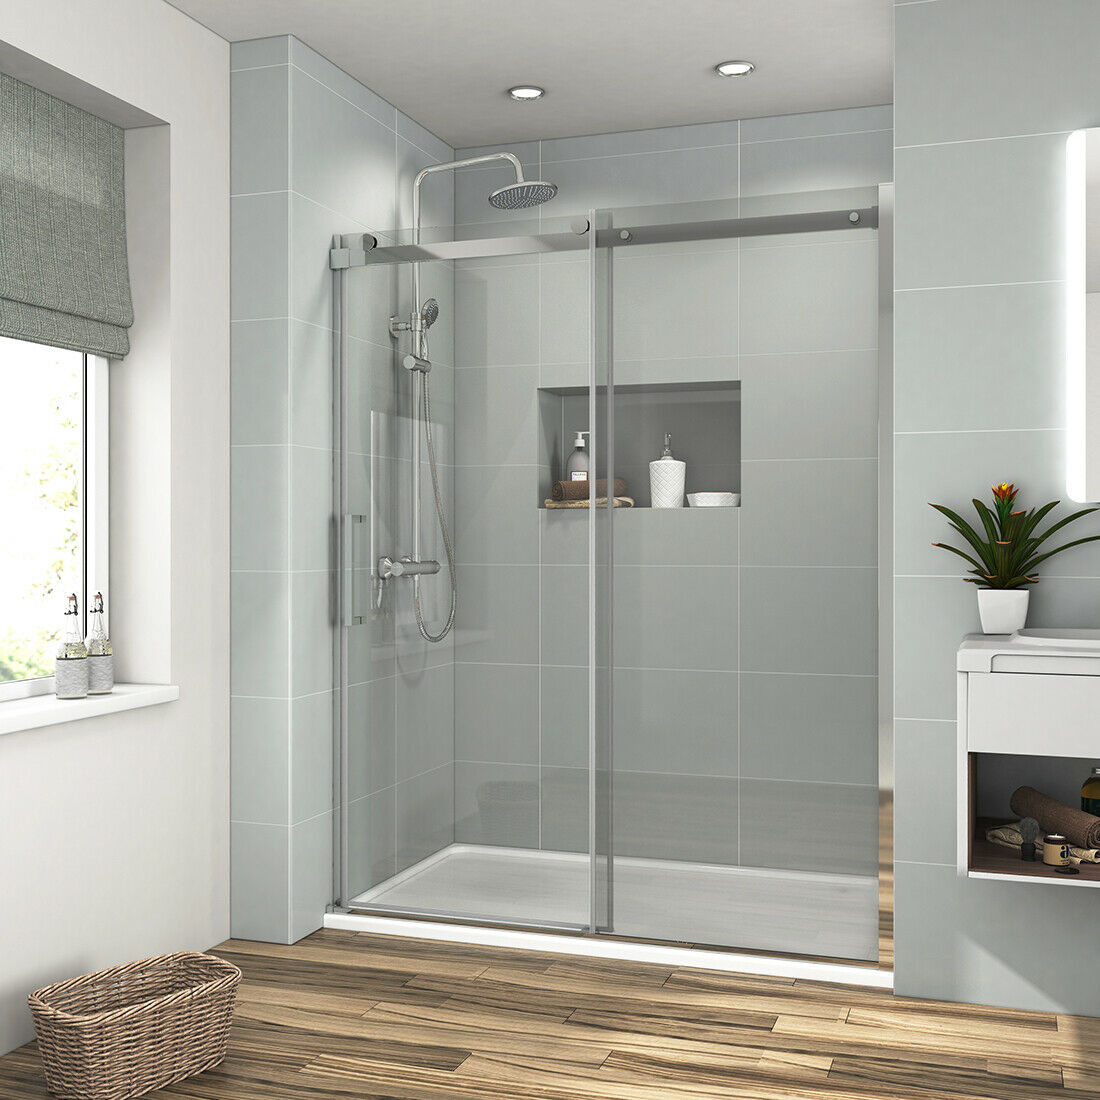 60 X 72 Frameless Sliding Shower Door Enclosure Screen 5 16 Glass Chrome